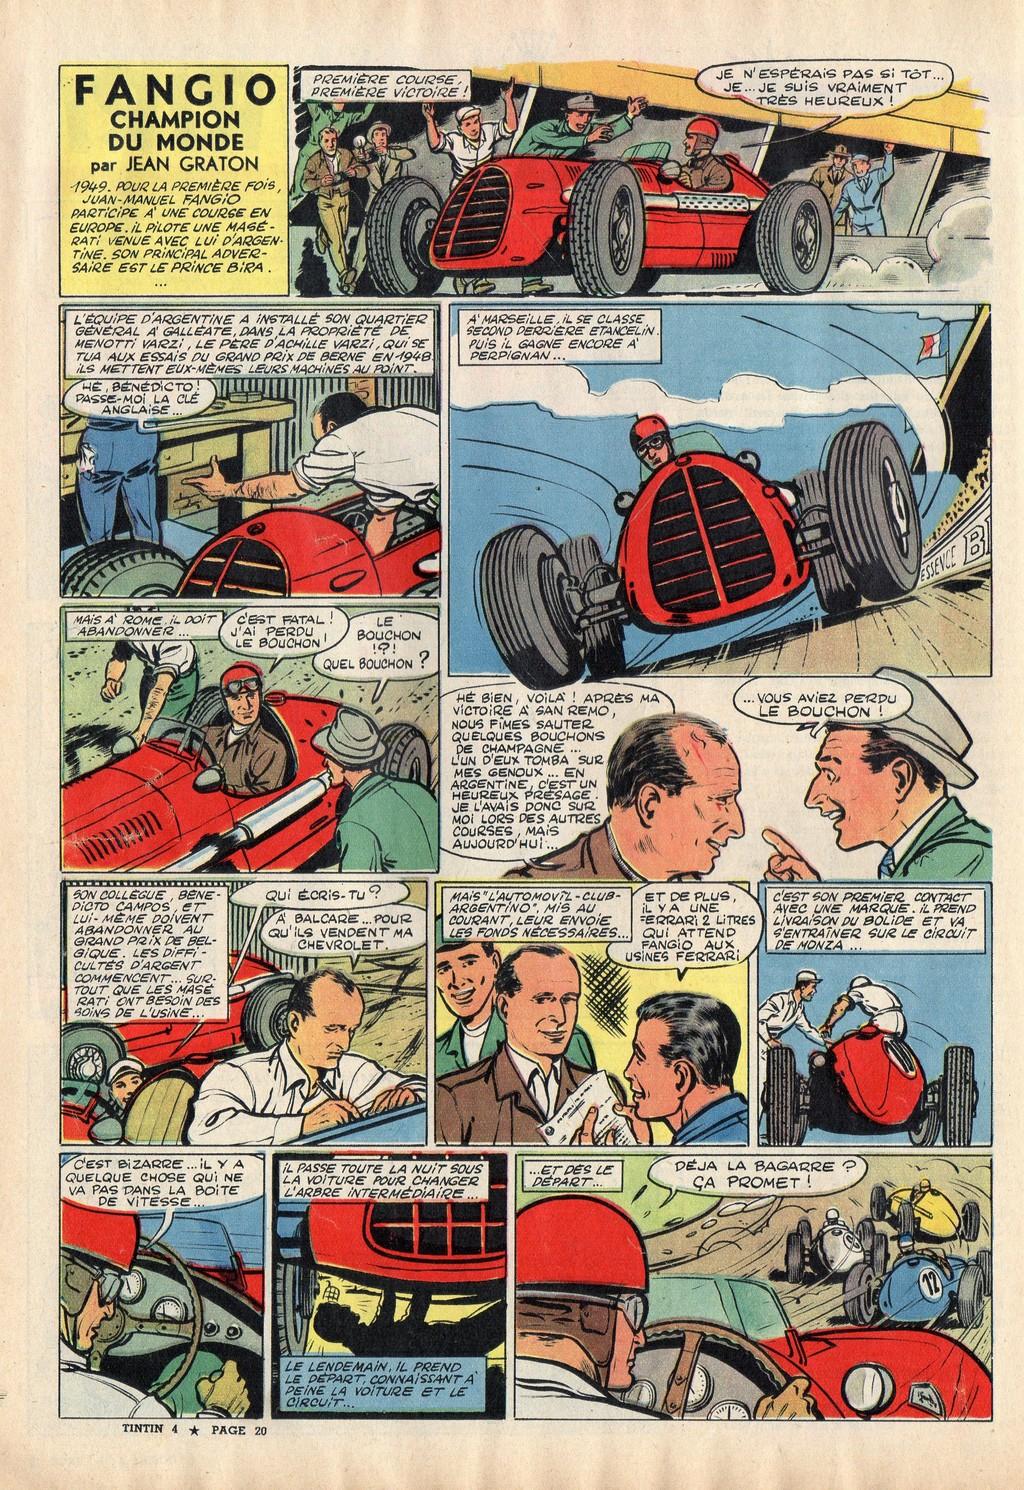 Fangio champion du monde (1)